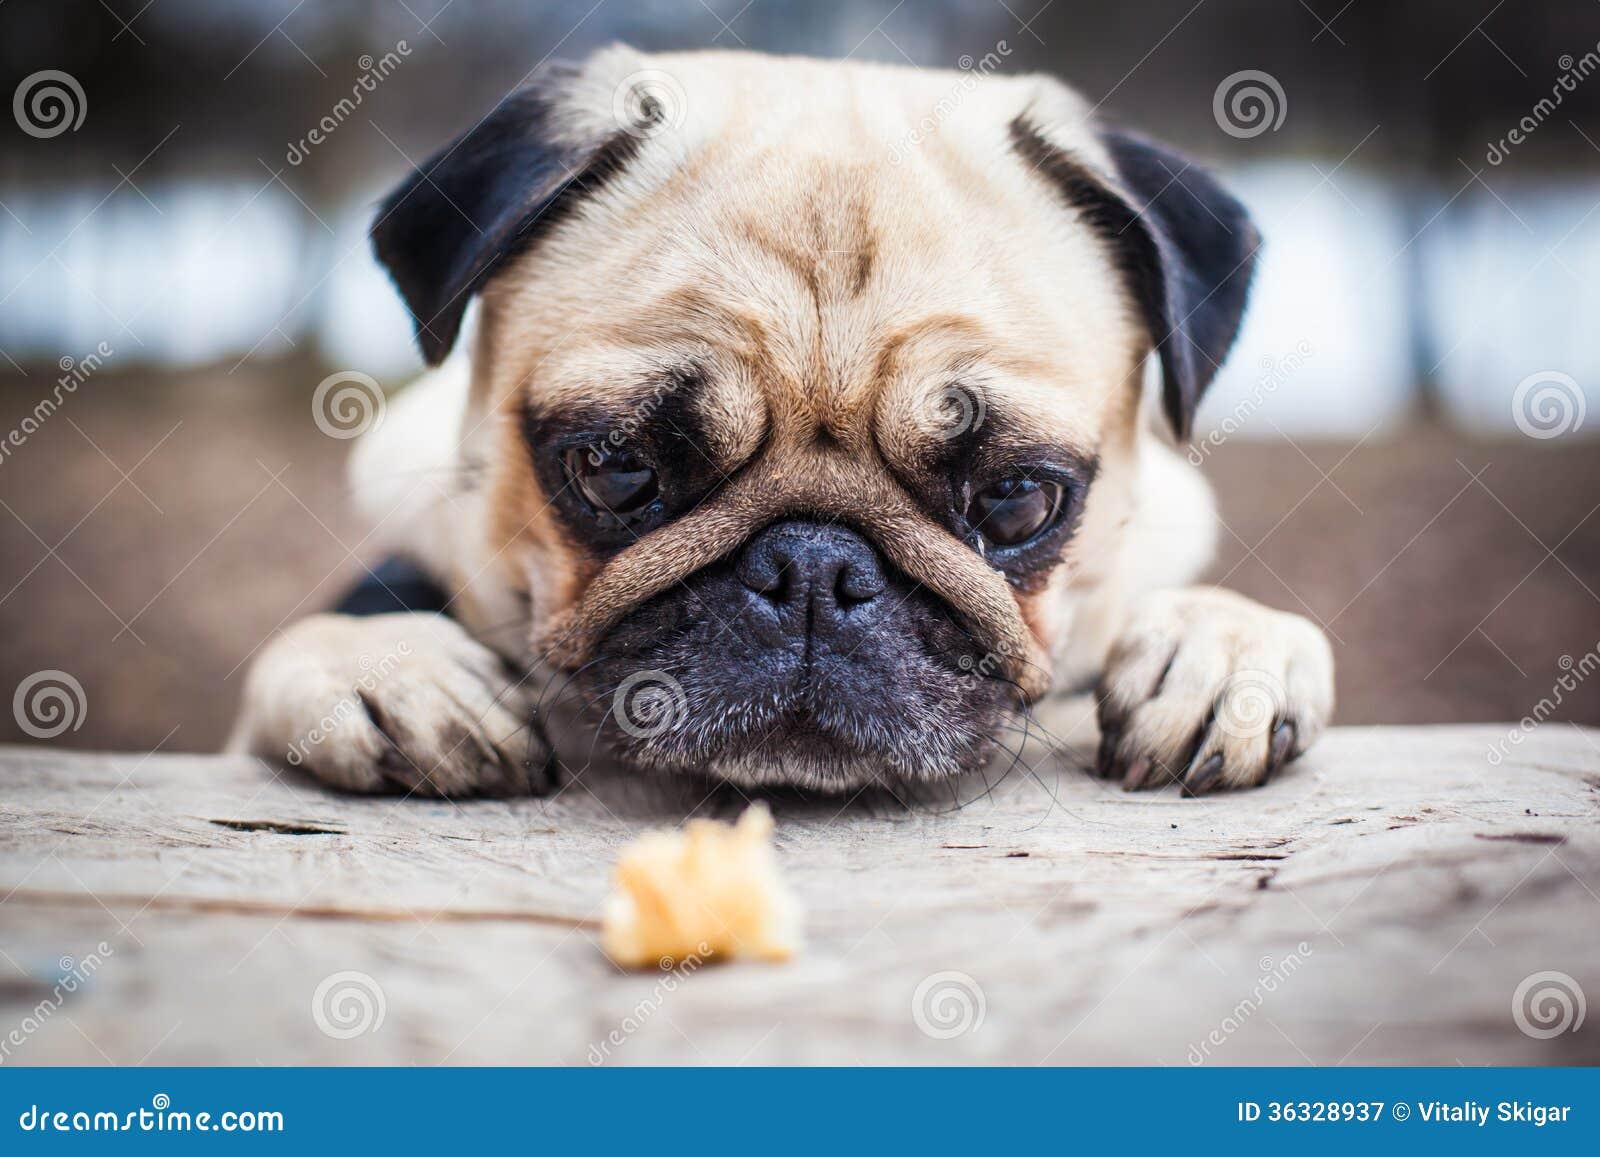 Wonderful Pug Canine Adorable Dog - cute-pug-dog-sad-flat-face-36328937  Pic_414518  .jpg